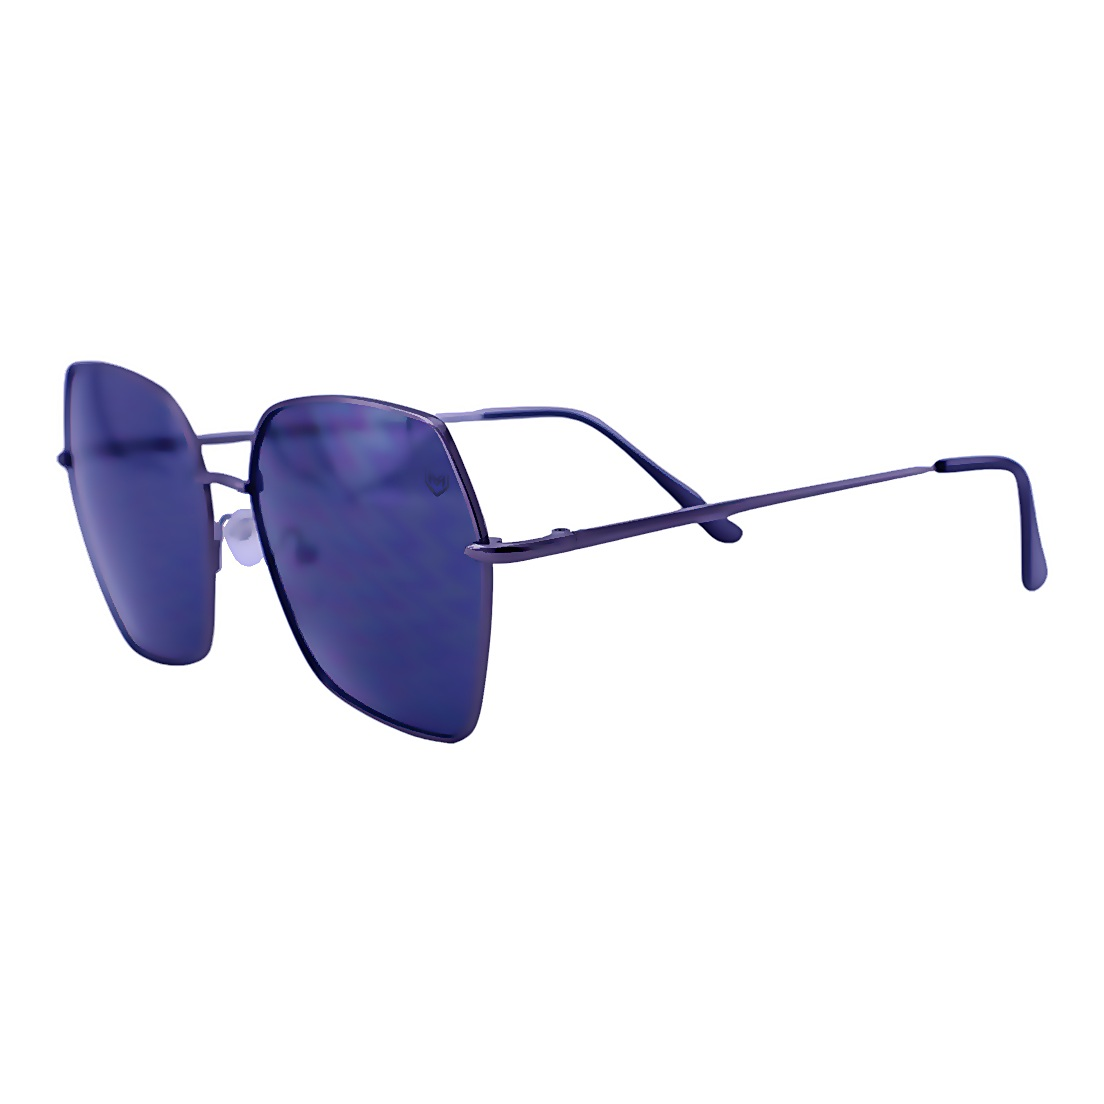 Óculos De Sol Mackage Feminino Hexagonal - Grafite